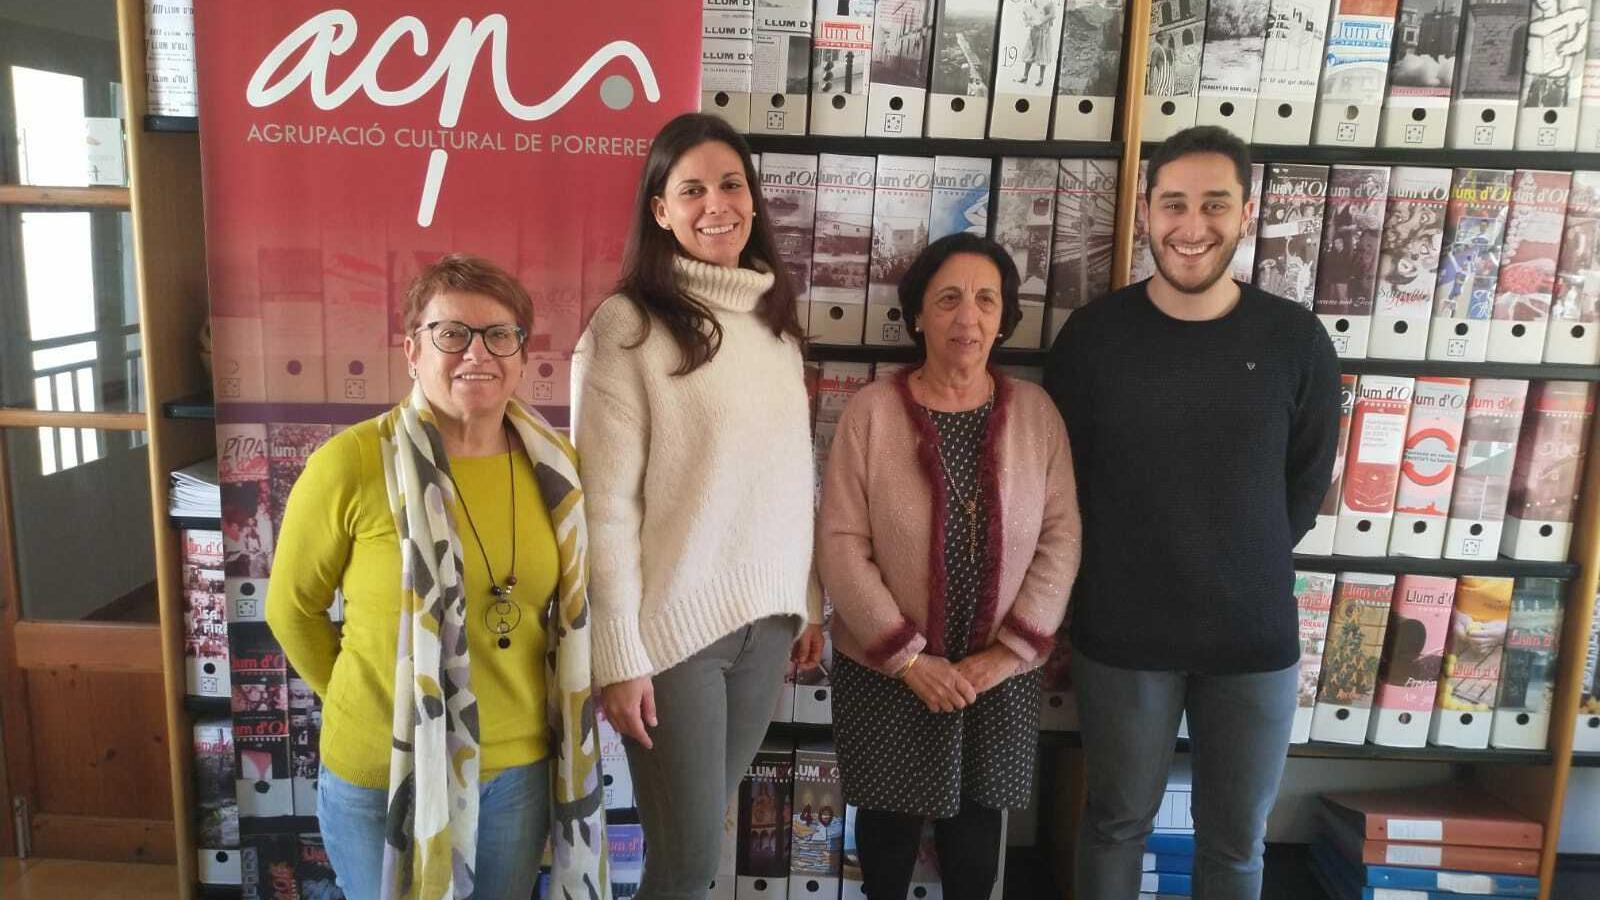 Joana Mora, Catalina M. Garí, Maria Barceló Crespí i Sebastià Lliteres.